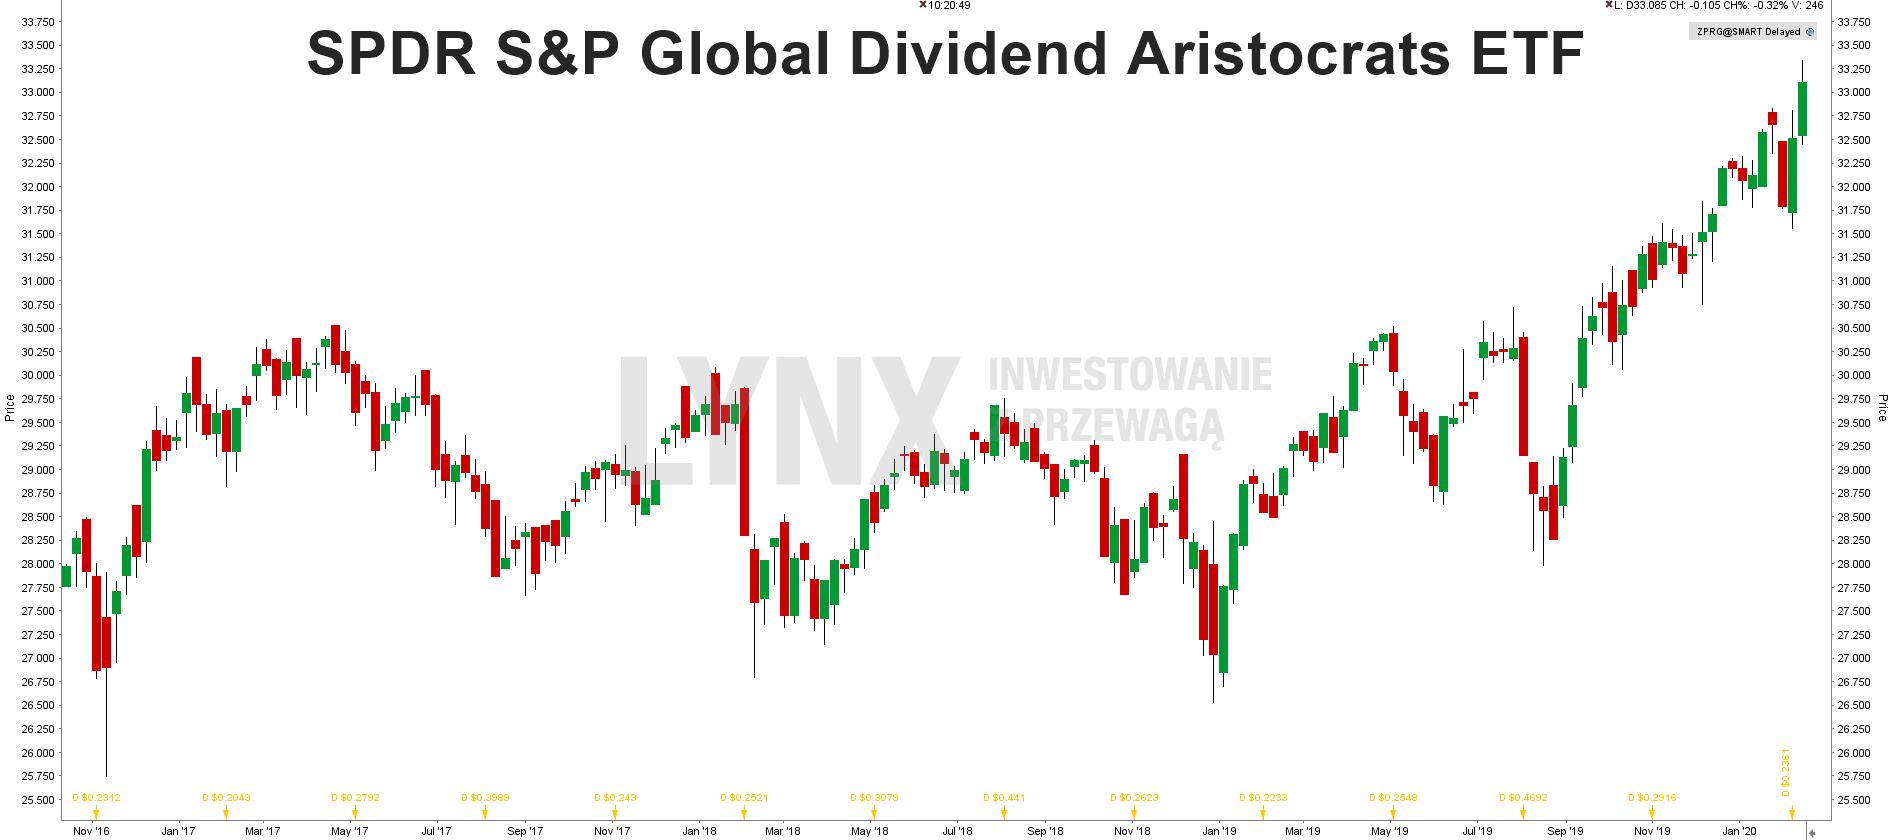 SPDR S&P Global Dividend Aristocrats ETF